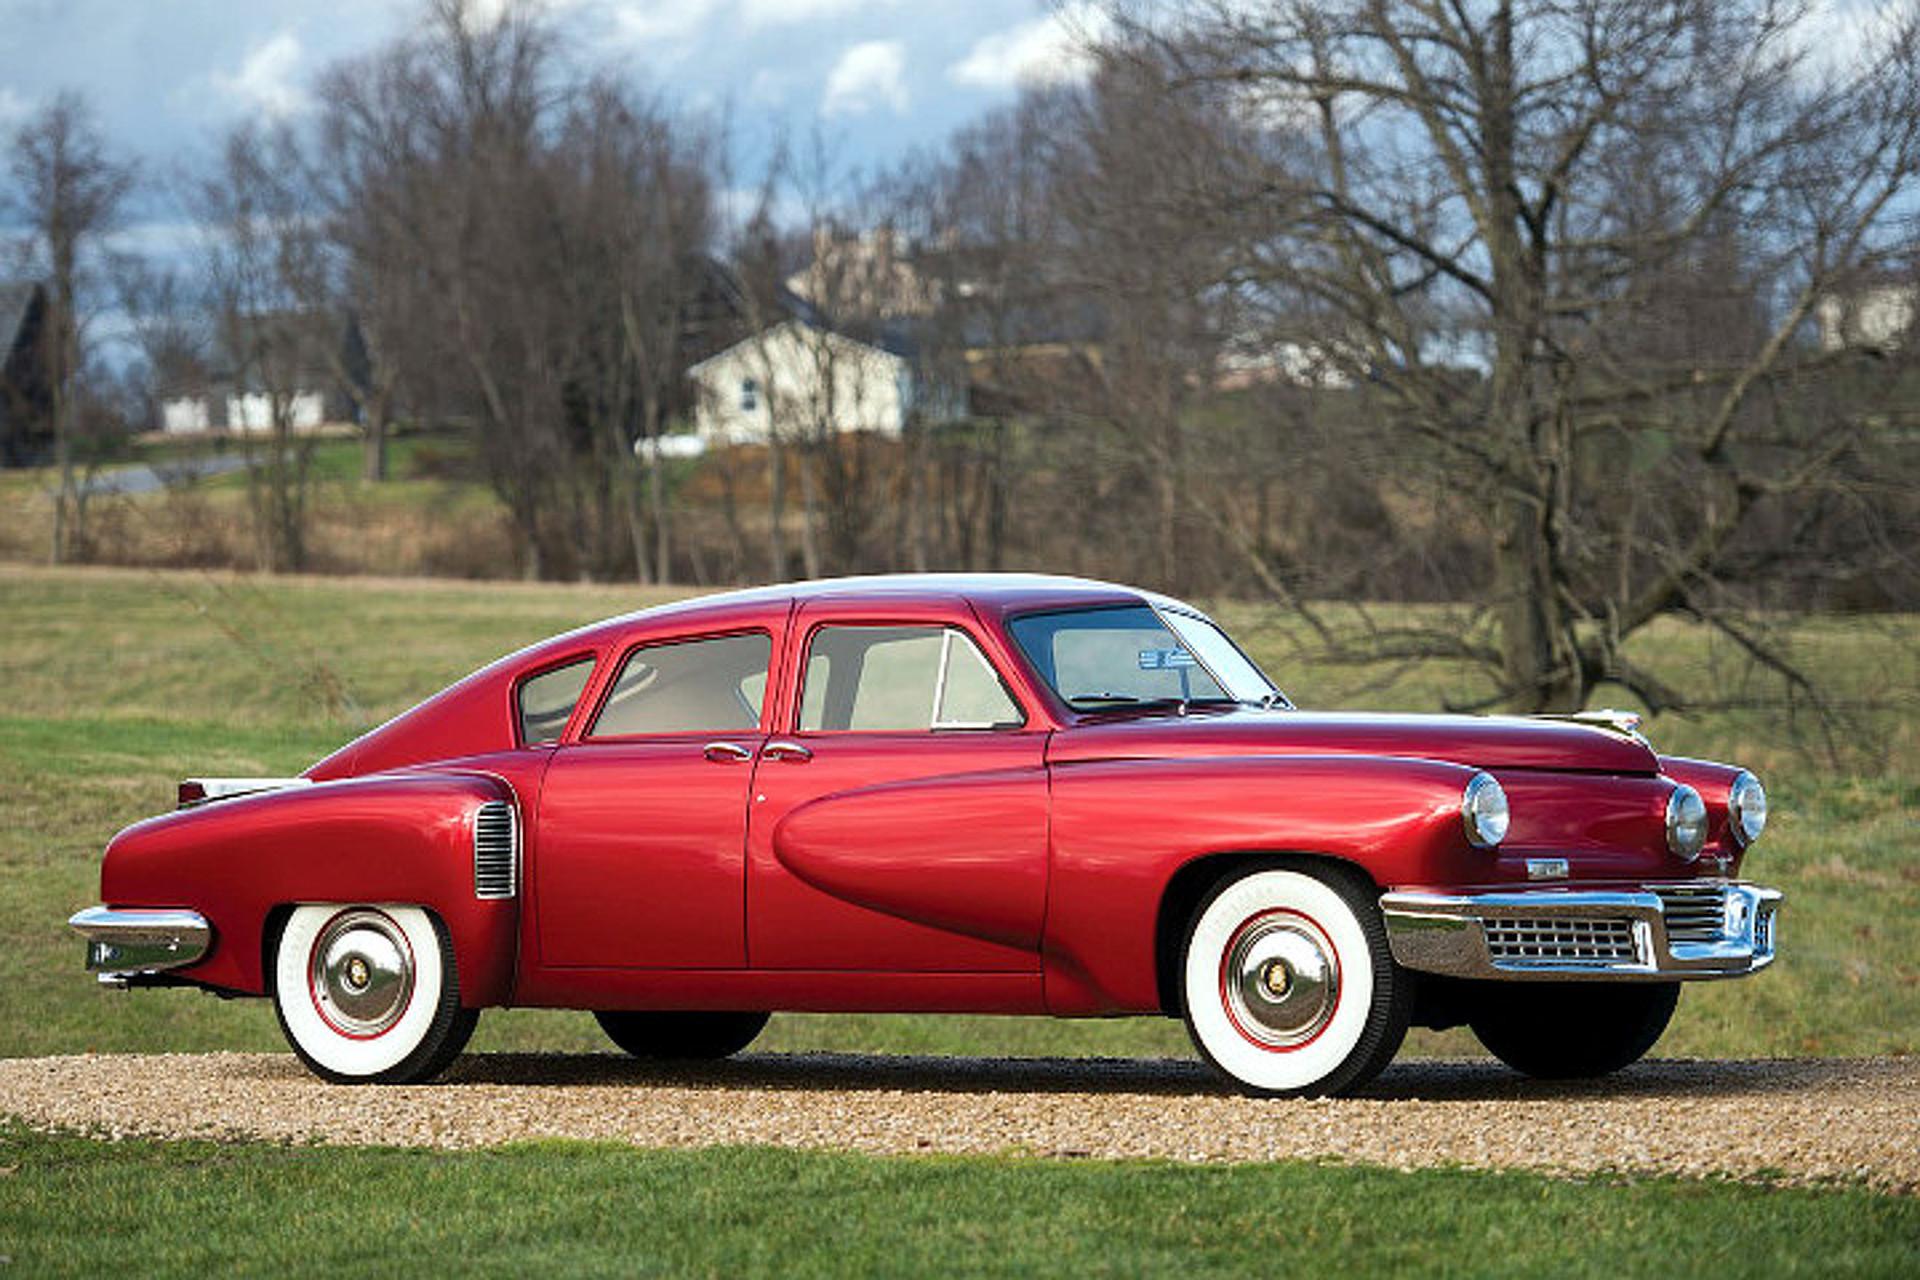 rare-tucker-48-prototype-goes-to-auction